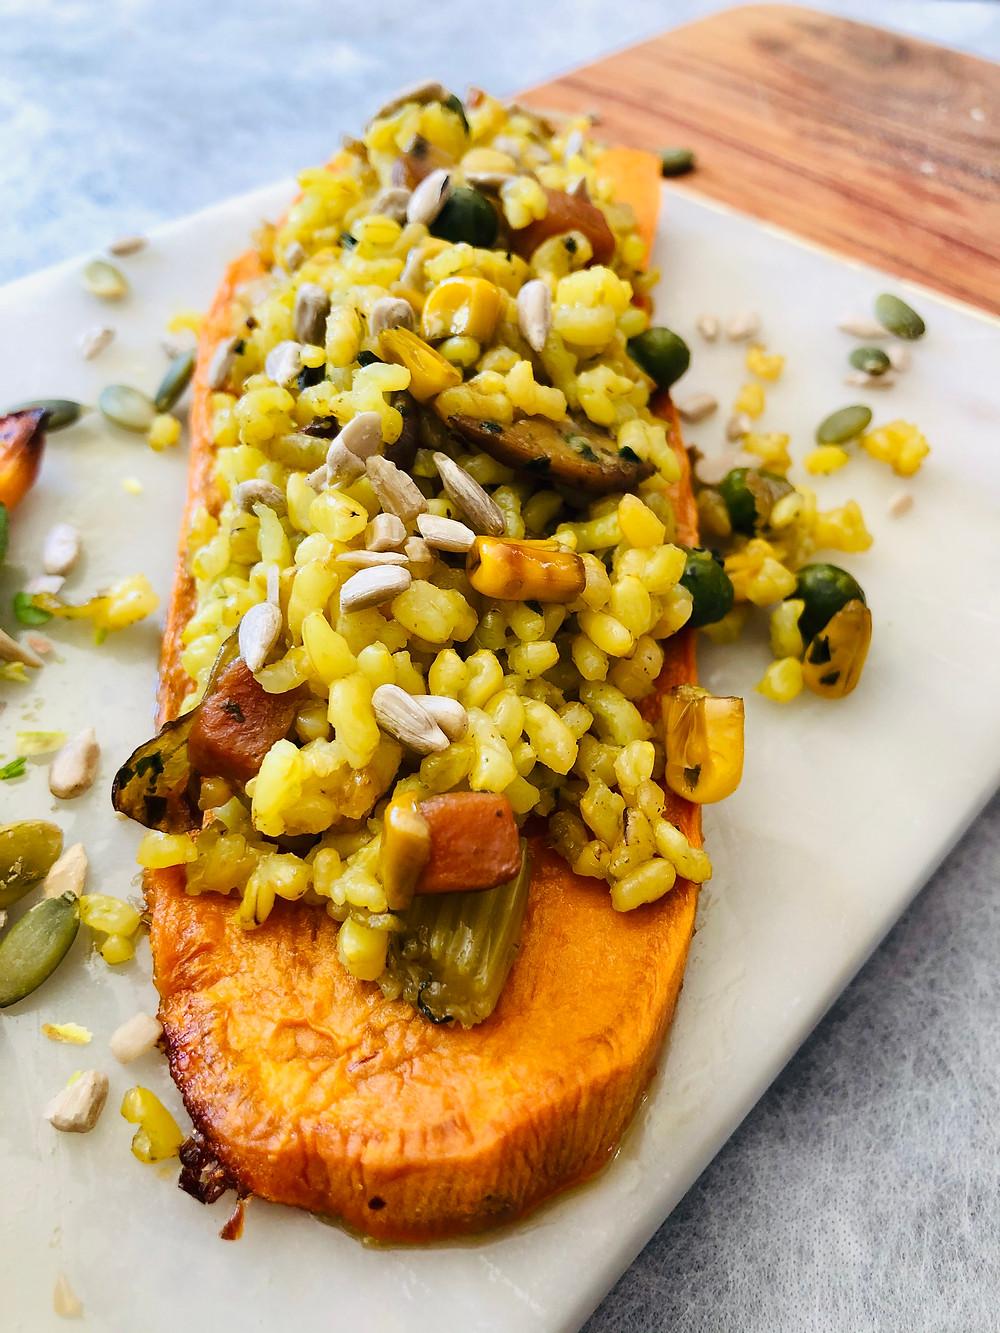 Yellow rice with veggies on sweet potatoes